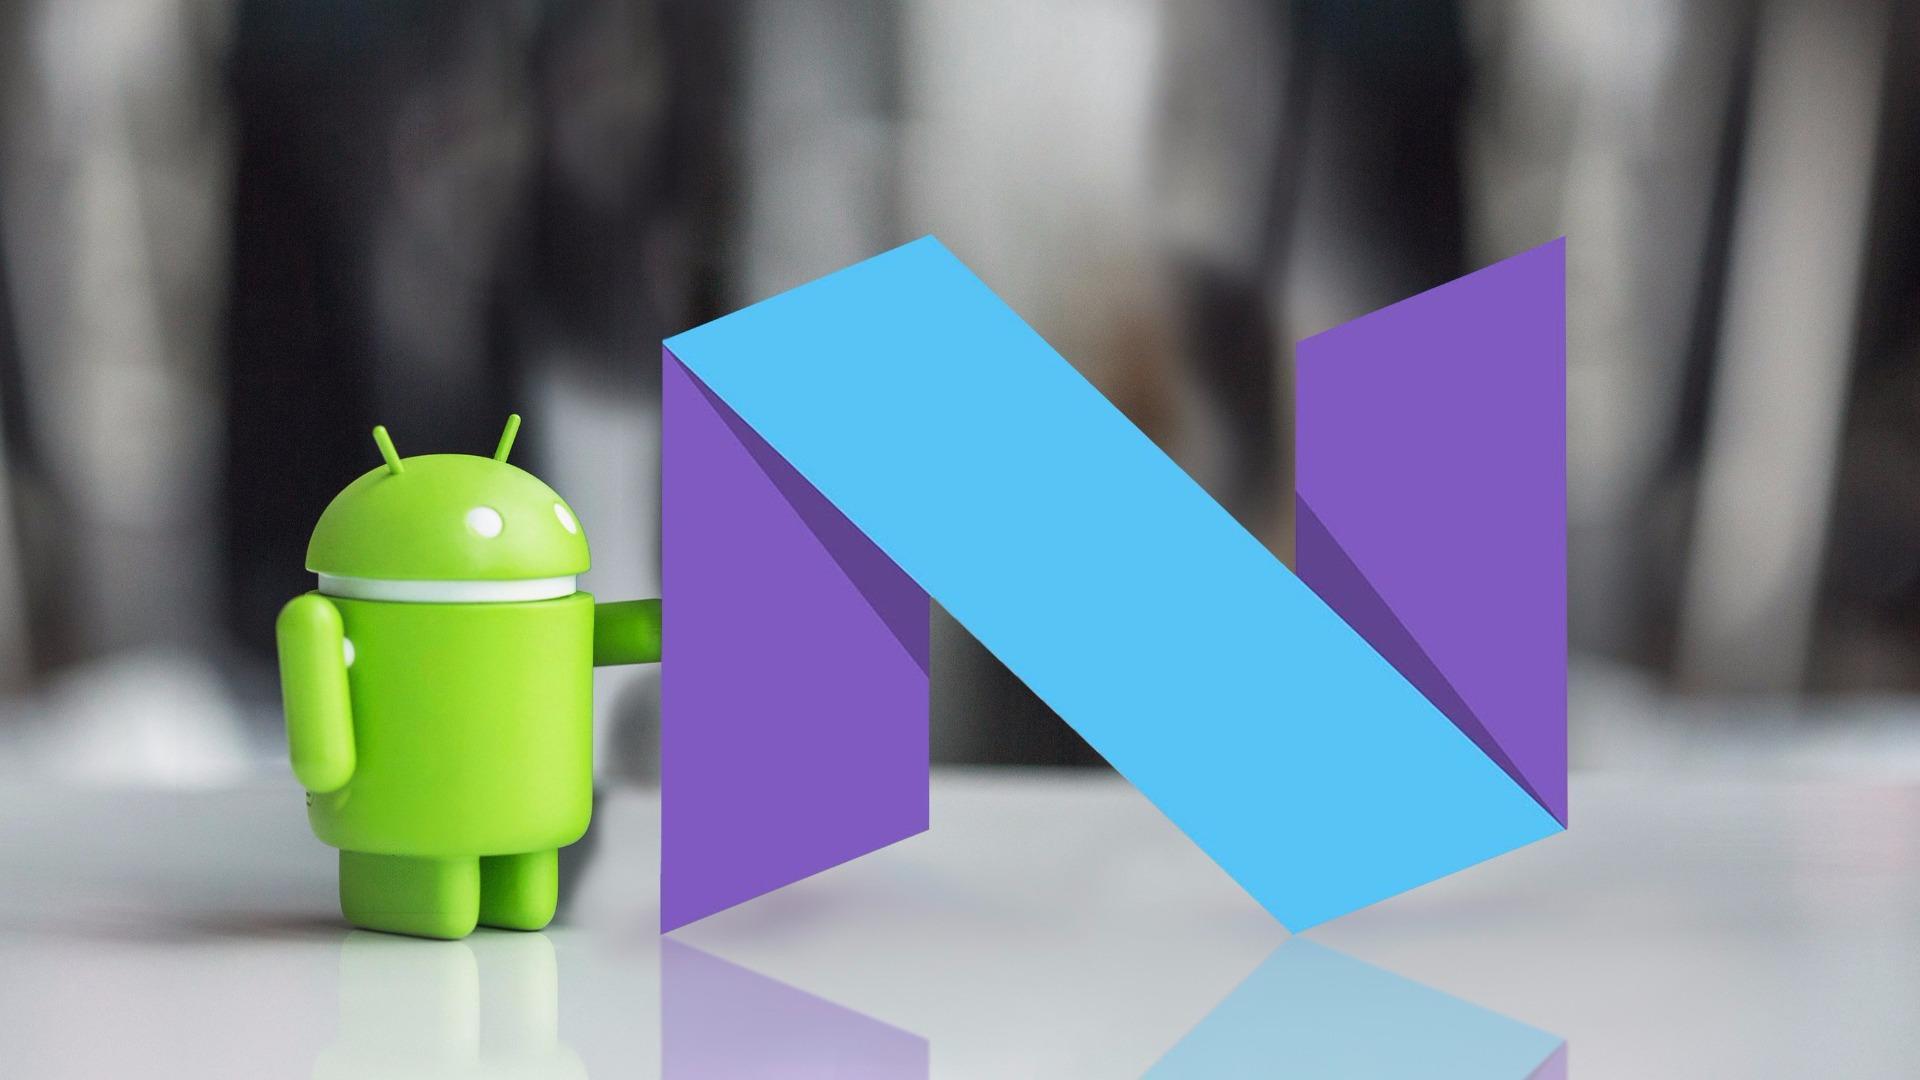 FileProvider 在 Android N 上的应用